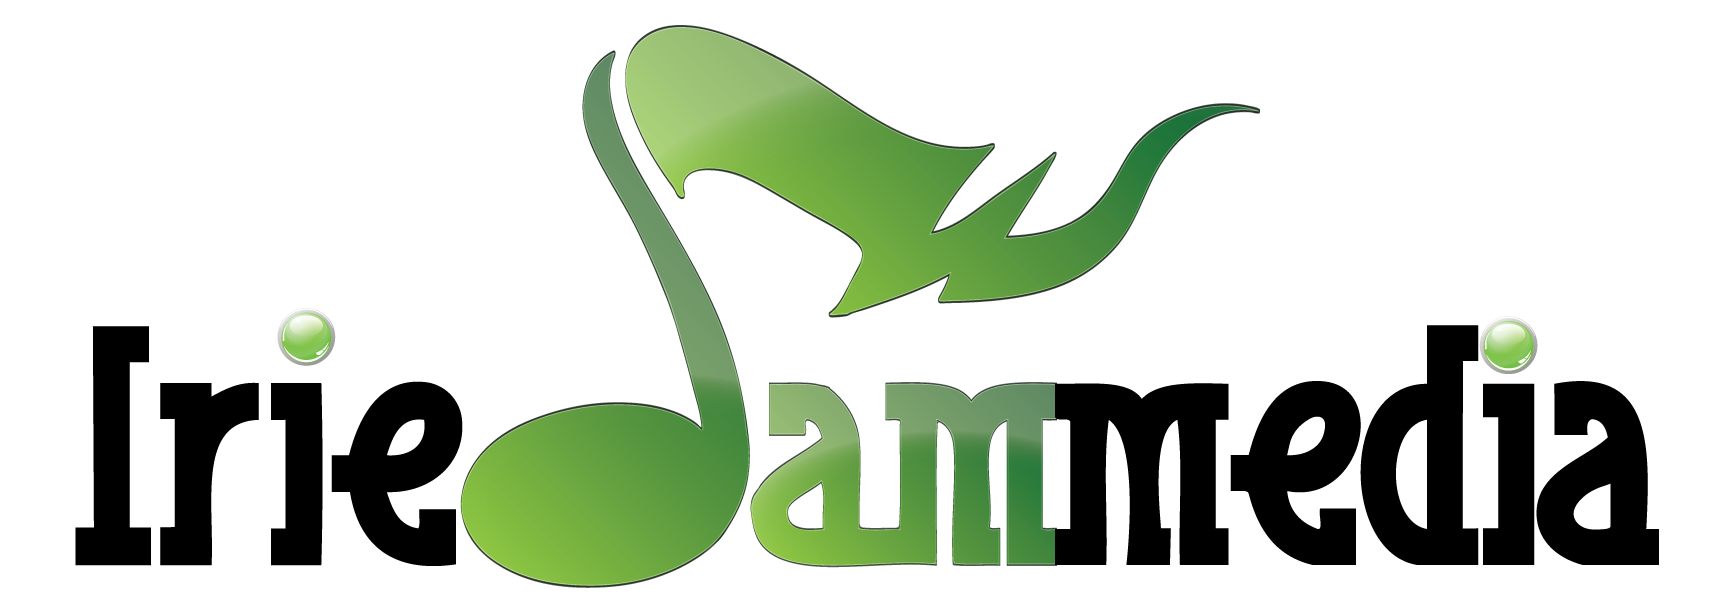 IrieJam Companies